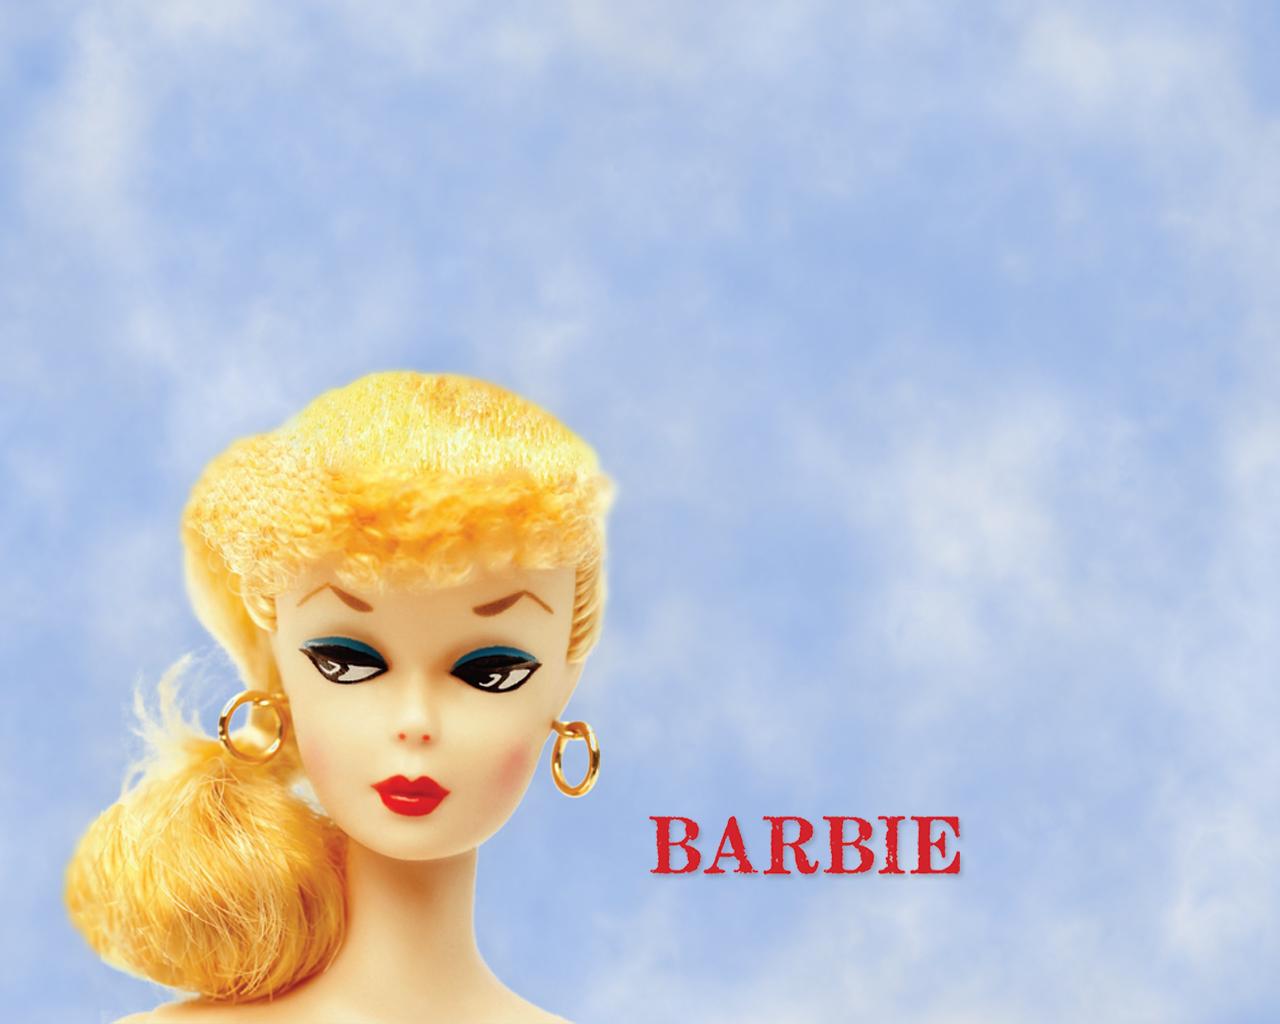 Barbie Cummings Nude Photos 73